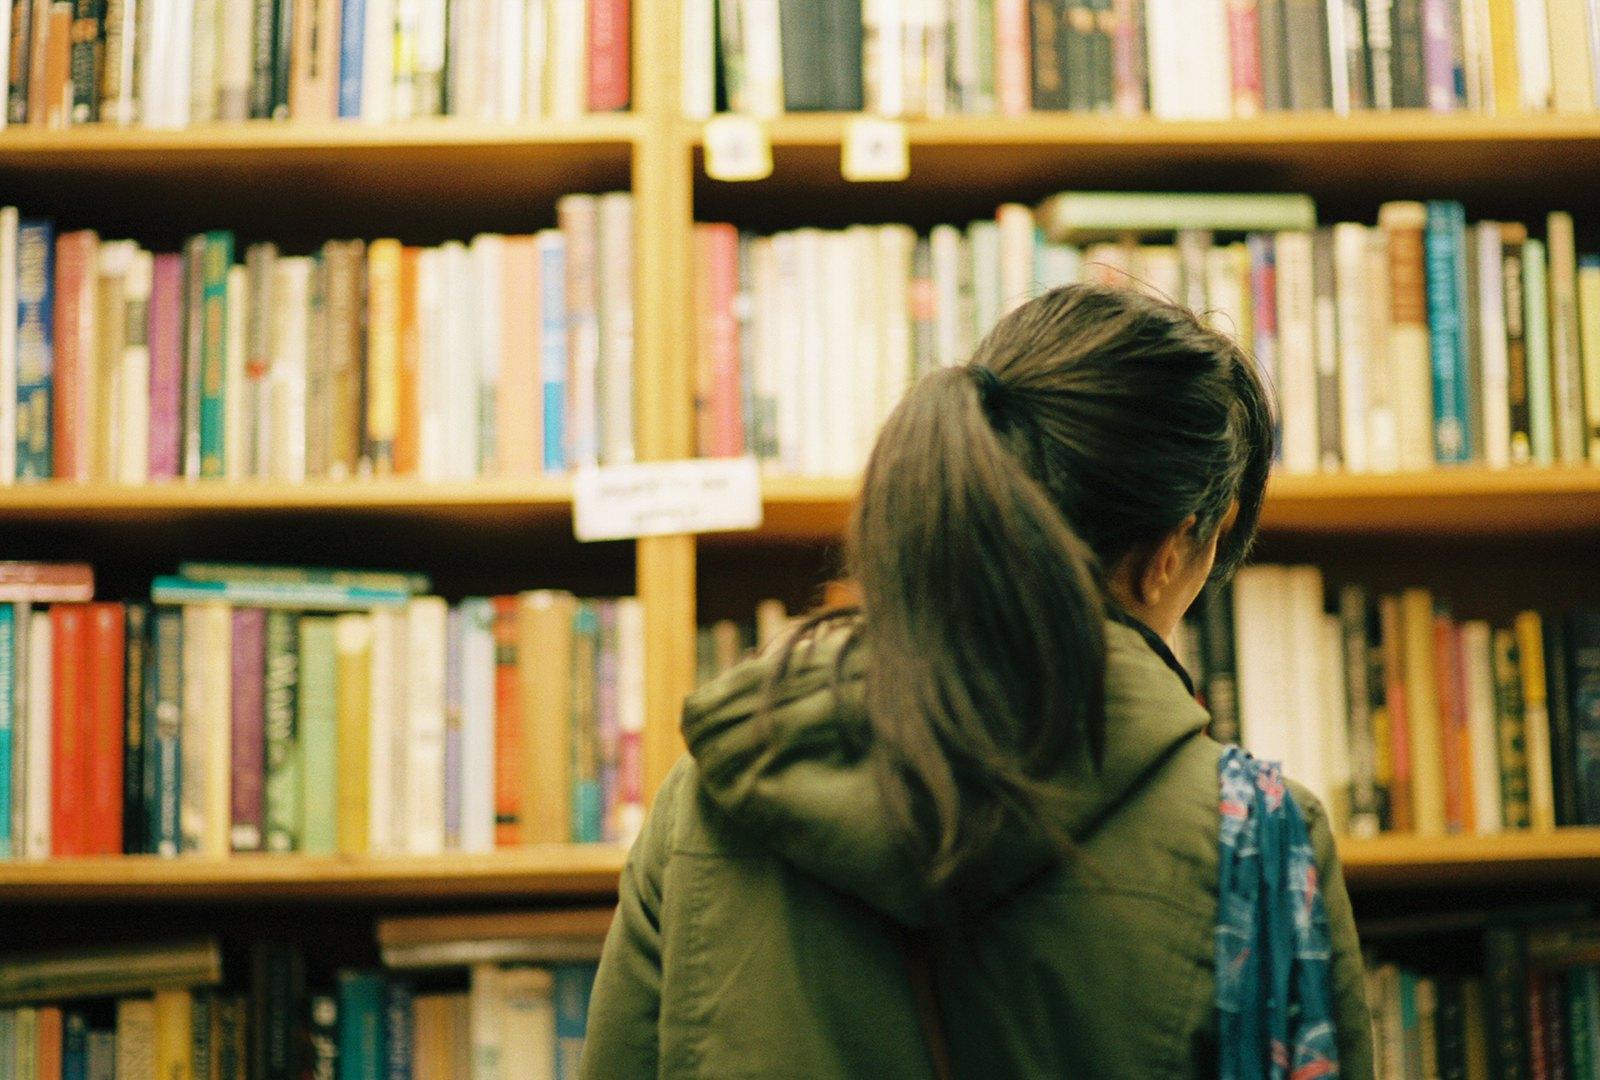 A girl peruses shelves of books